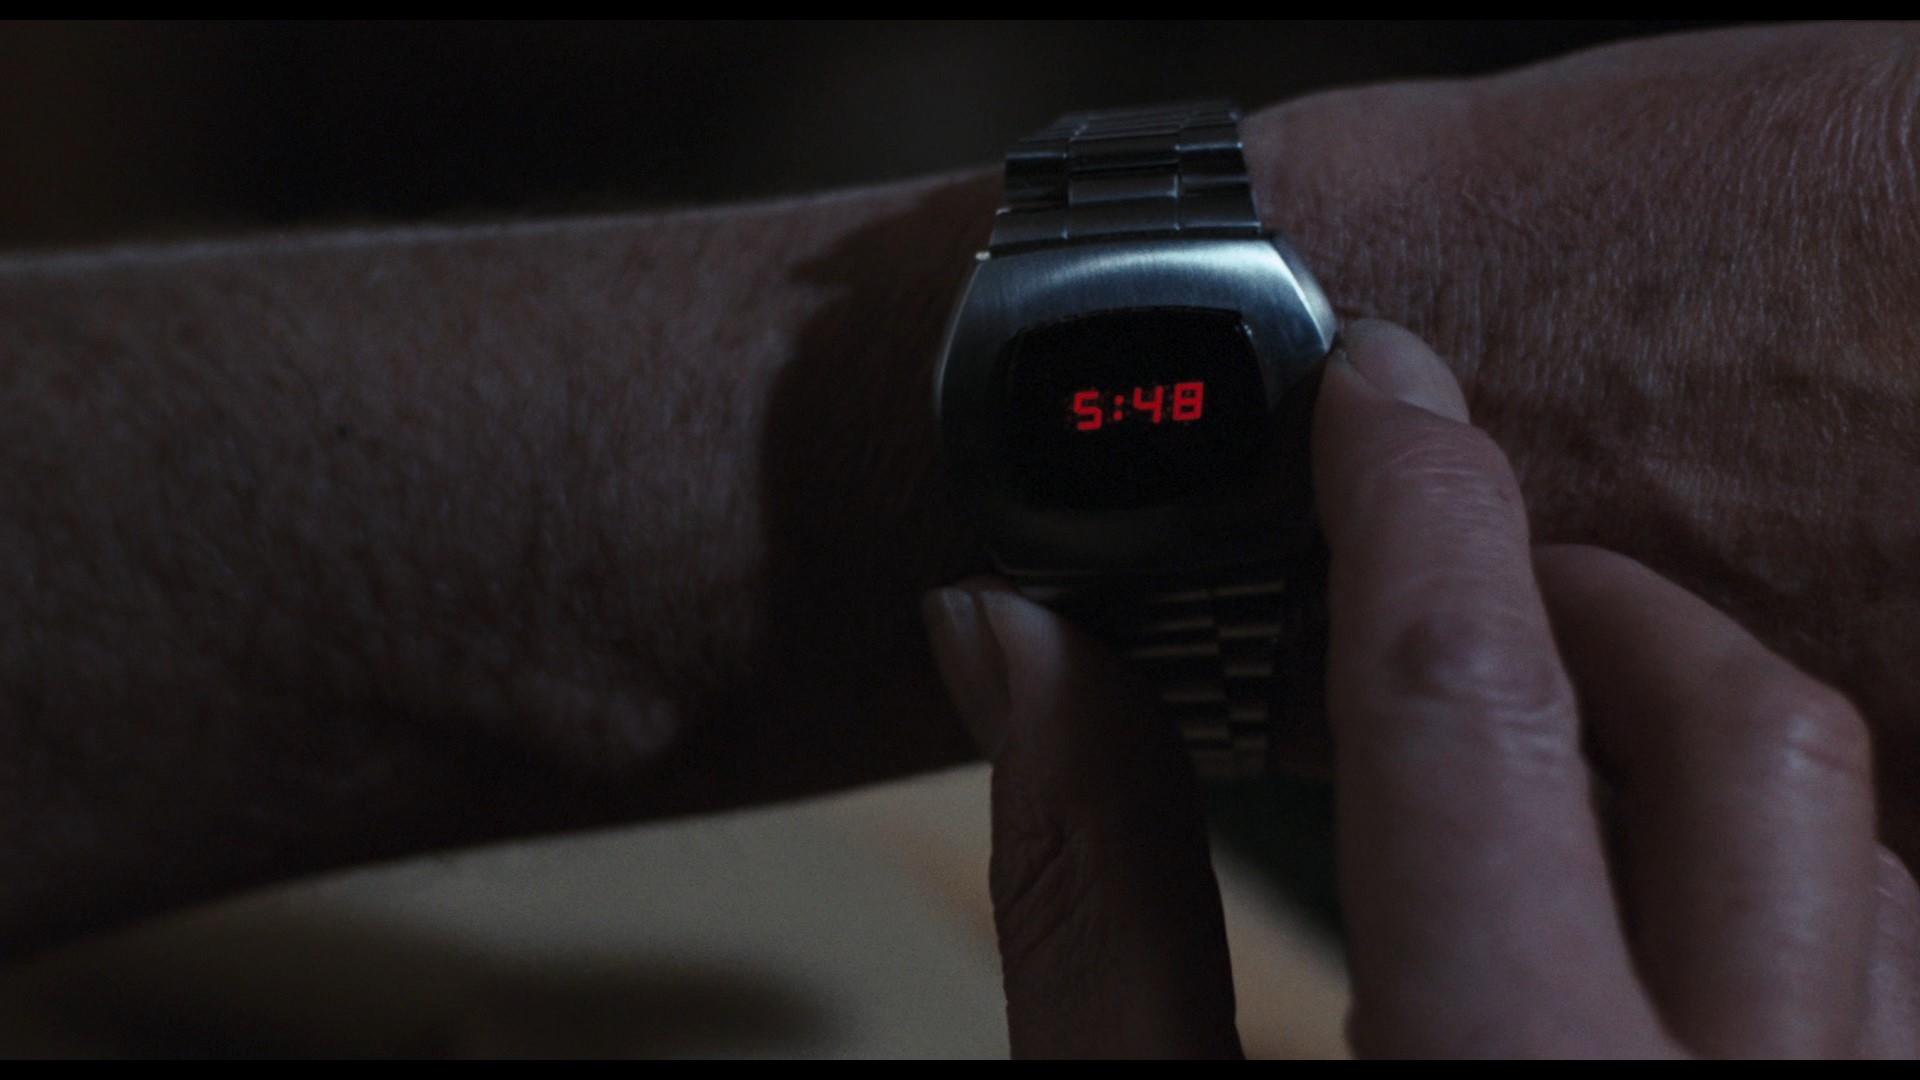 JAMES BOND: LIVE AND LET DIE (1973) - James Bond's (Roger Moore) Hamilton Pulsar Watch, On-set Photo - Image 10 of 13